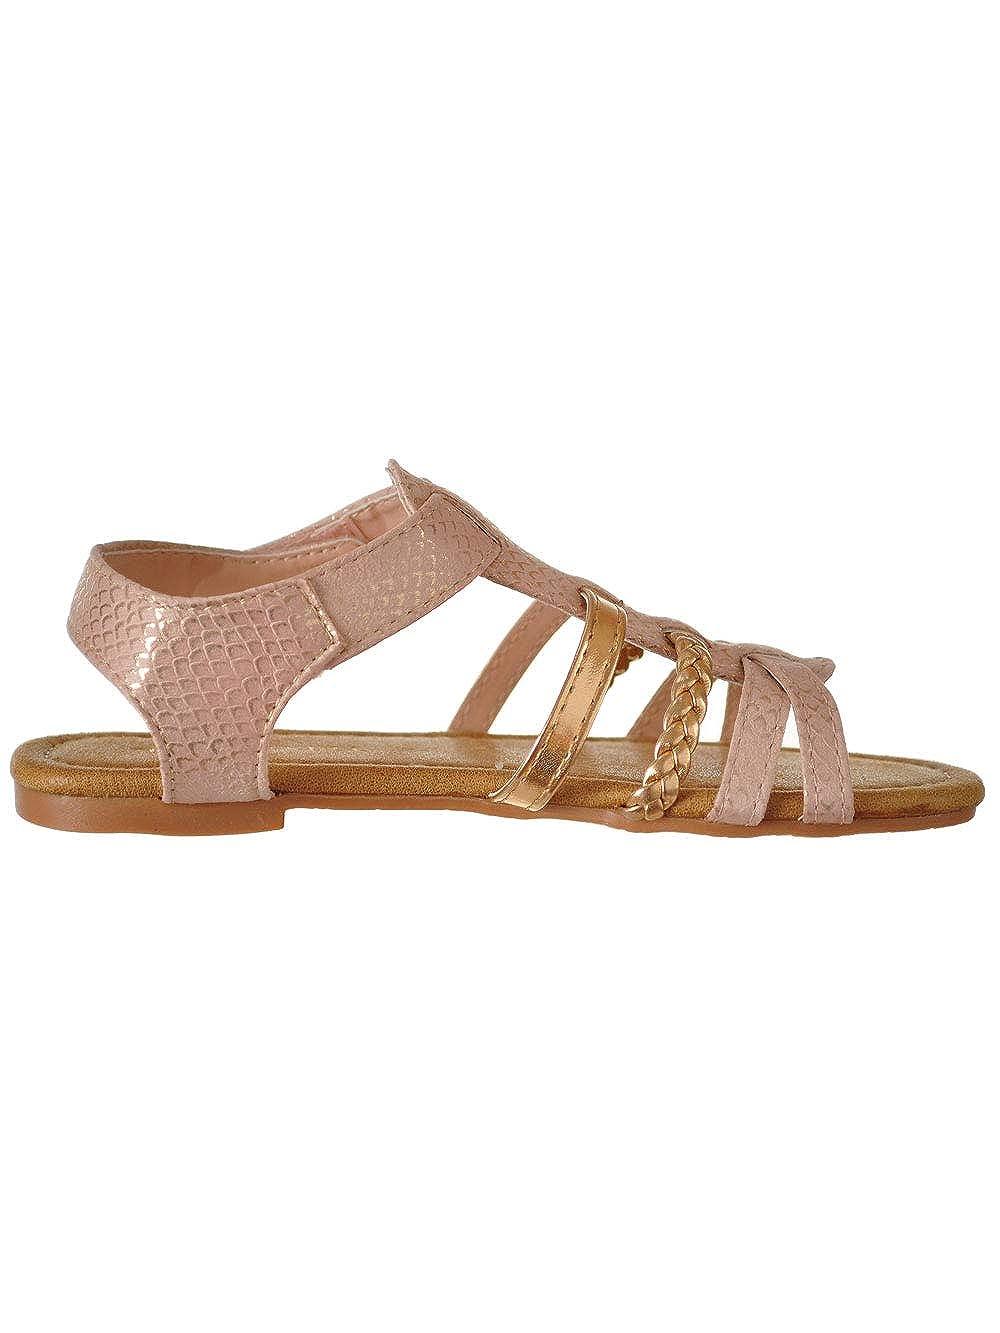 Tahari Girls Sandals